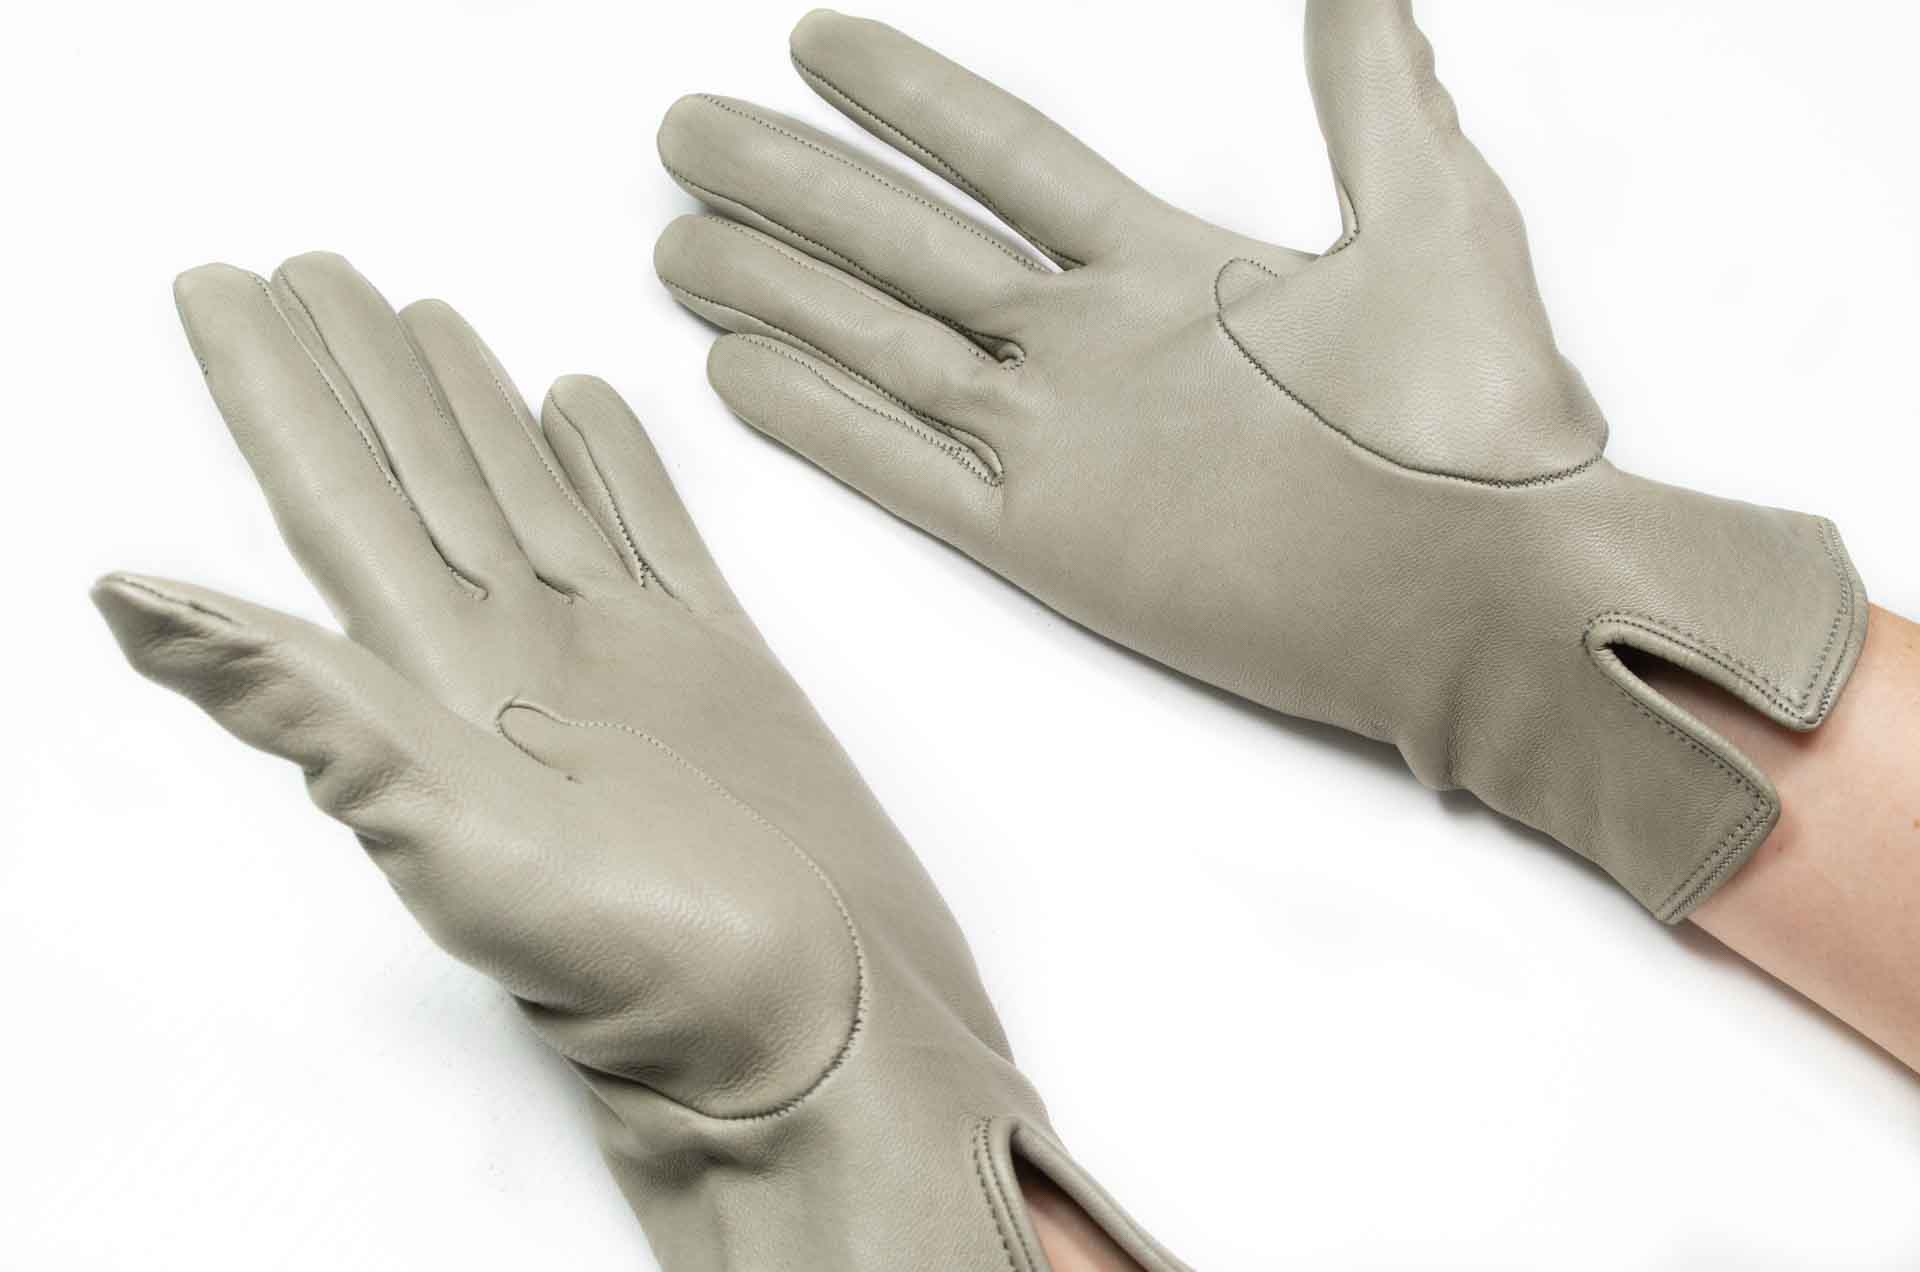 guanti in pelle grigi 7